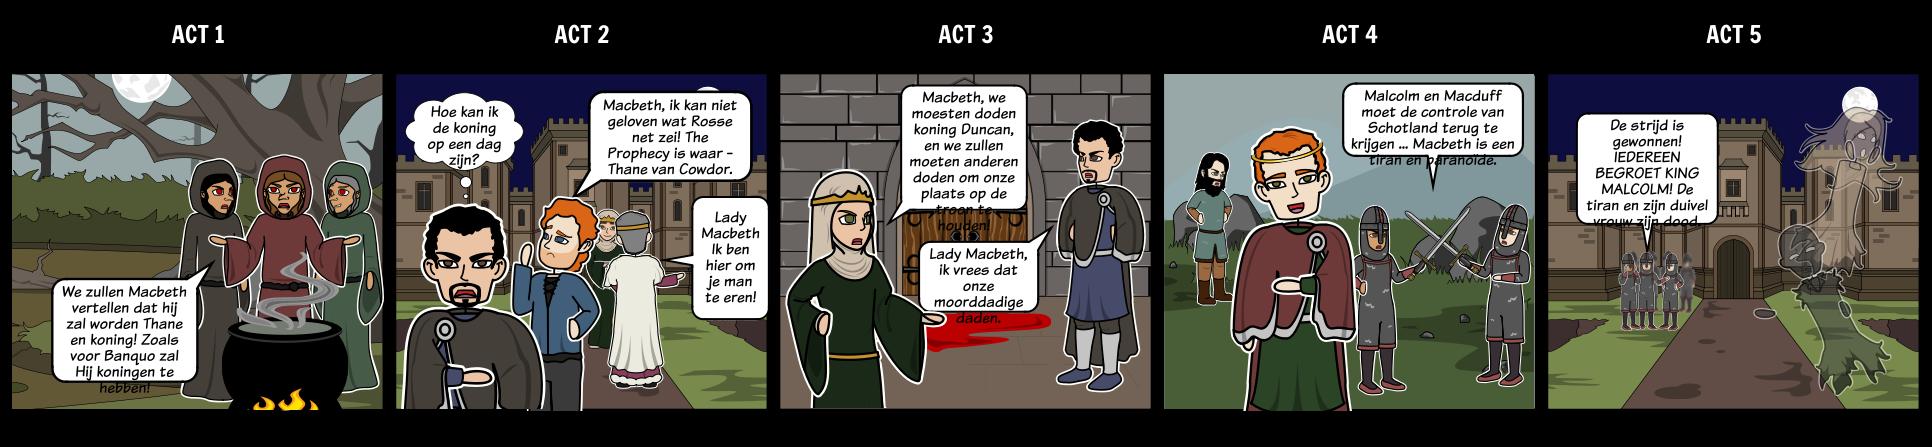 Macbeth 5 Wet Structuur Storyboard